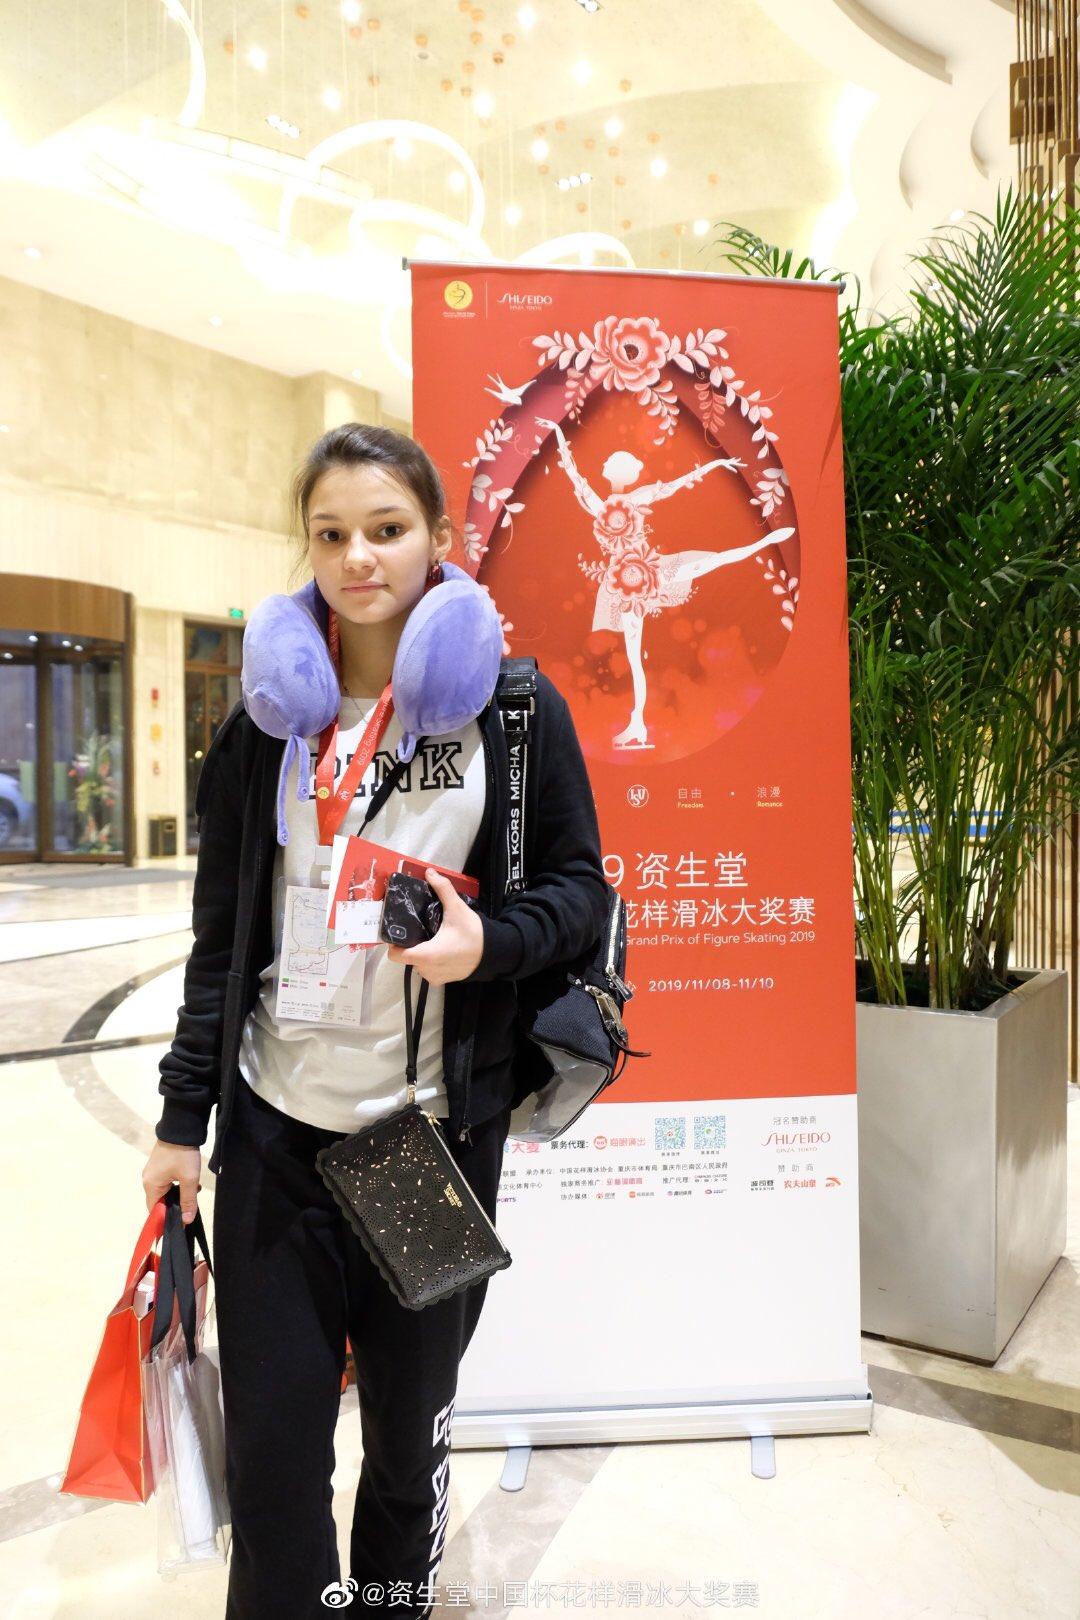 GP - 4 этап. Cup of China Chongqing / CHN November 8-10, 2019 - Страница 2 EIsyk7MU8AAWpe6?format=jpg&name=large